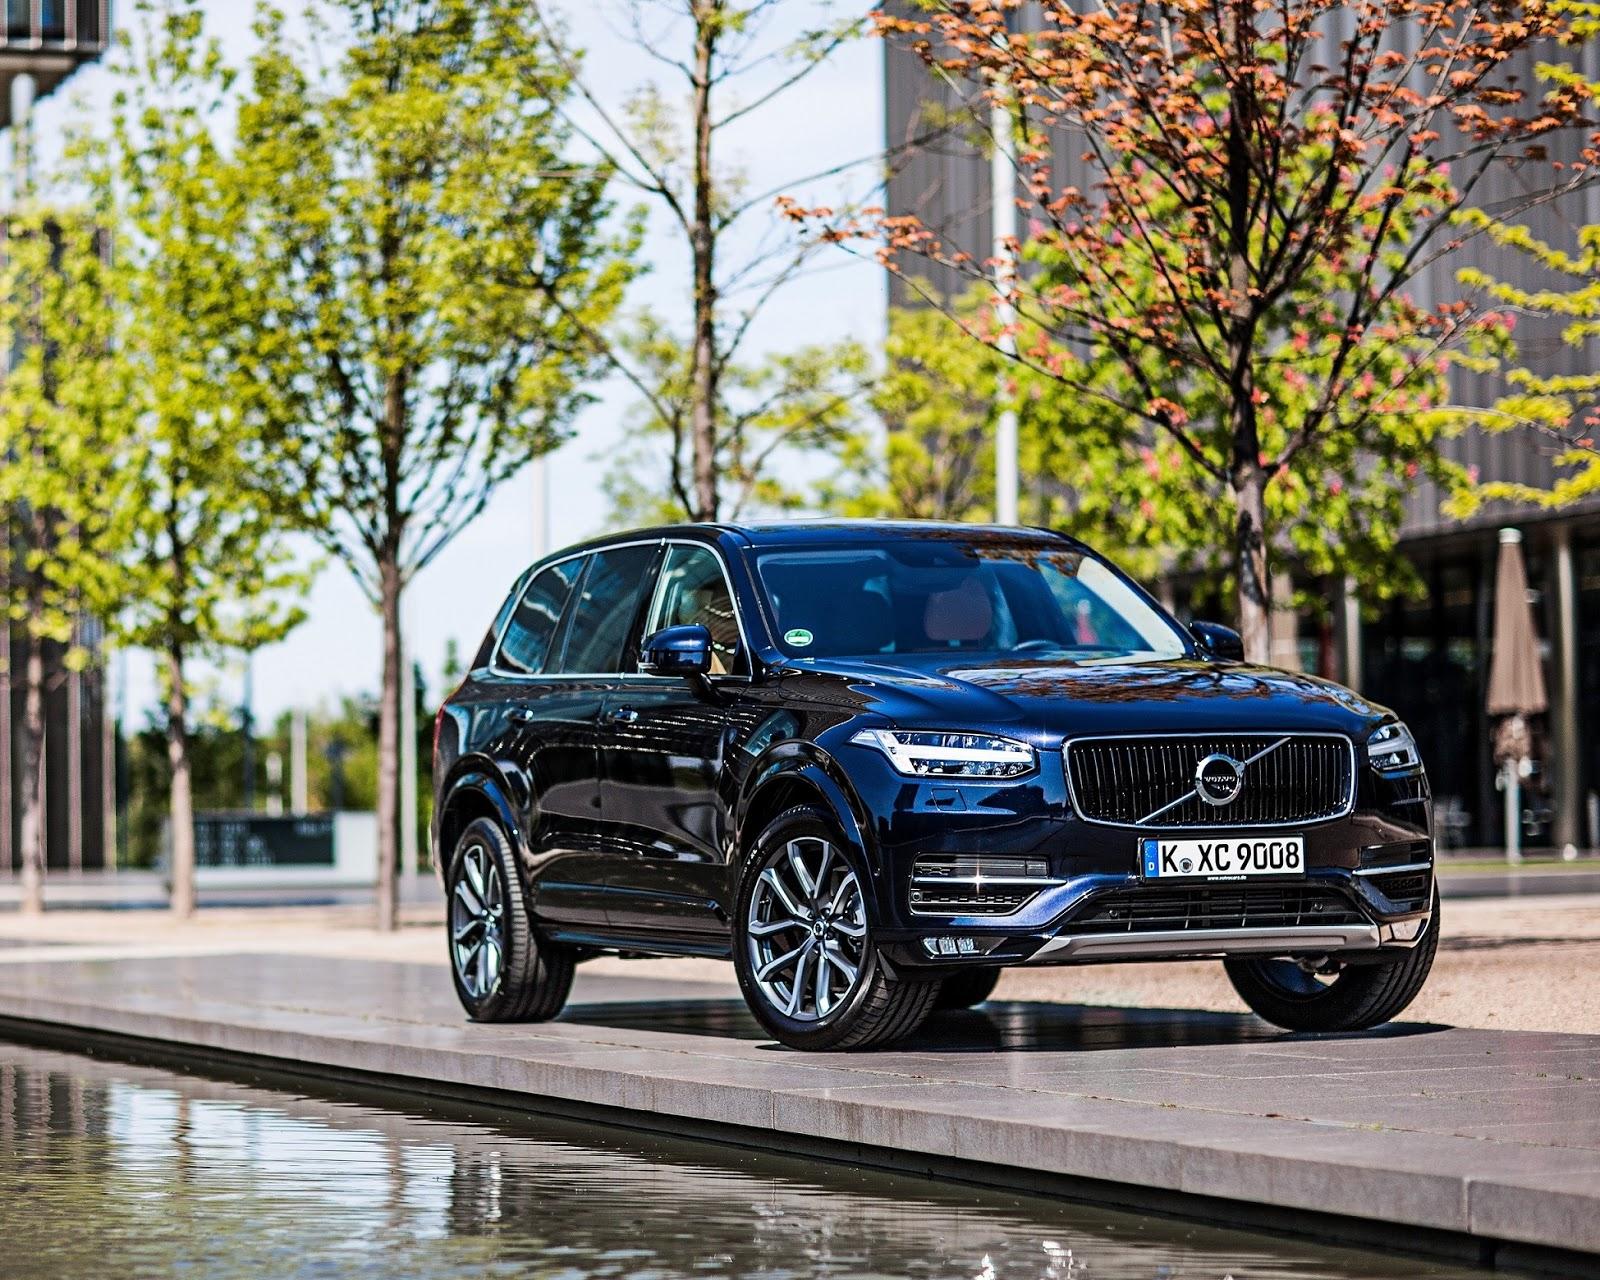 NEW%2BVOLVO%2BXC90%2B%25281%2529 Το Volvo XC90 κατακτά το βραβείο του ασφαλέστερου αυτοκινήτου